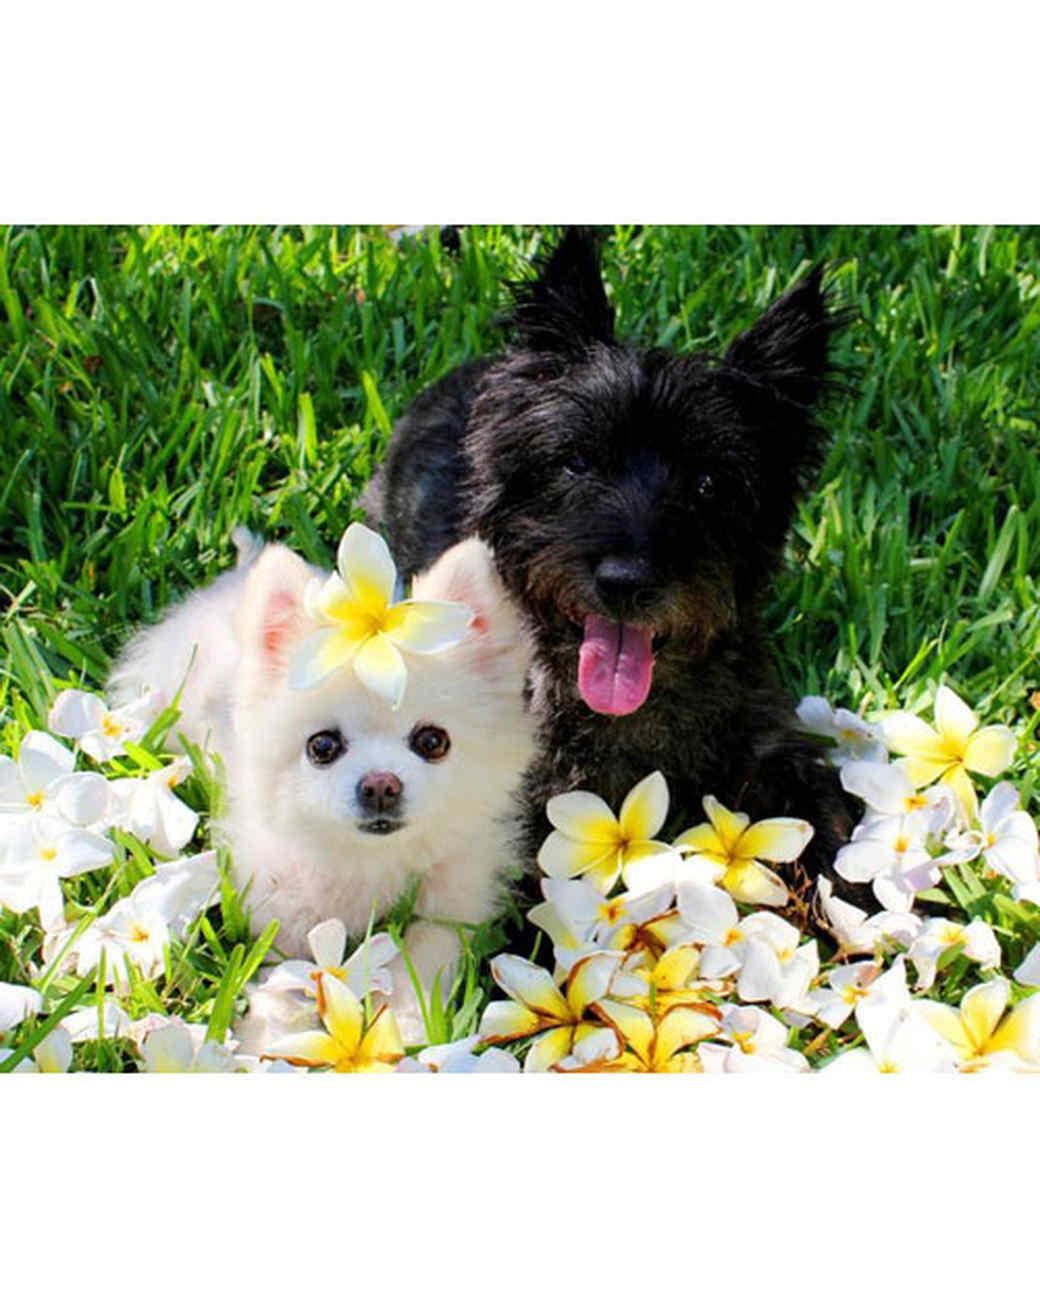 pets-13549553-26478336.jpg